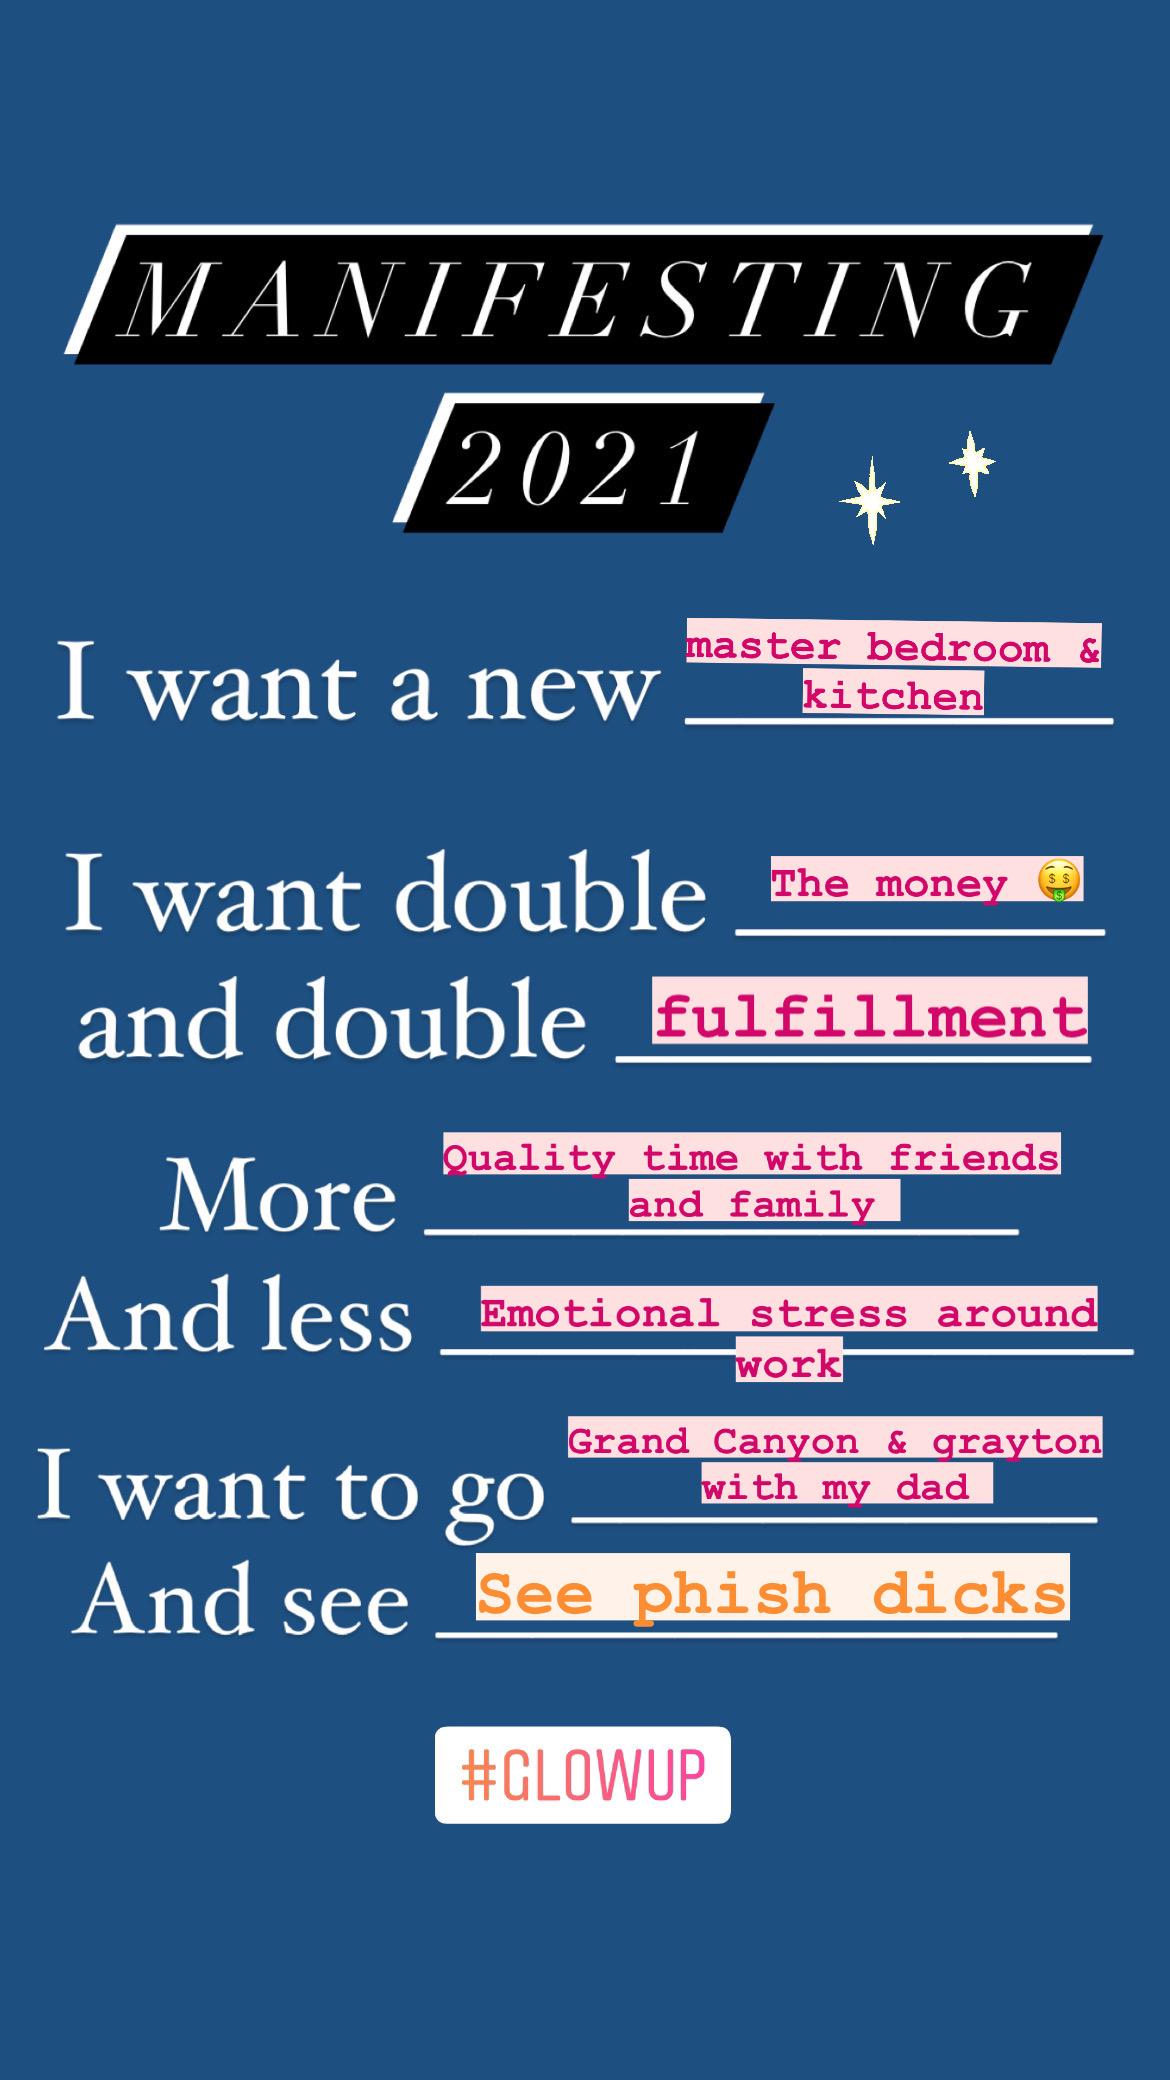 Manifesting #2021 Glow Up